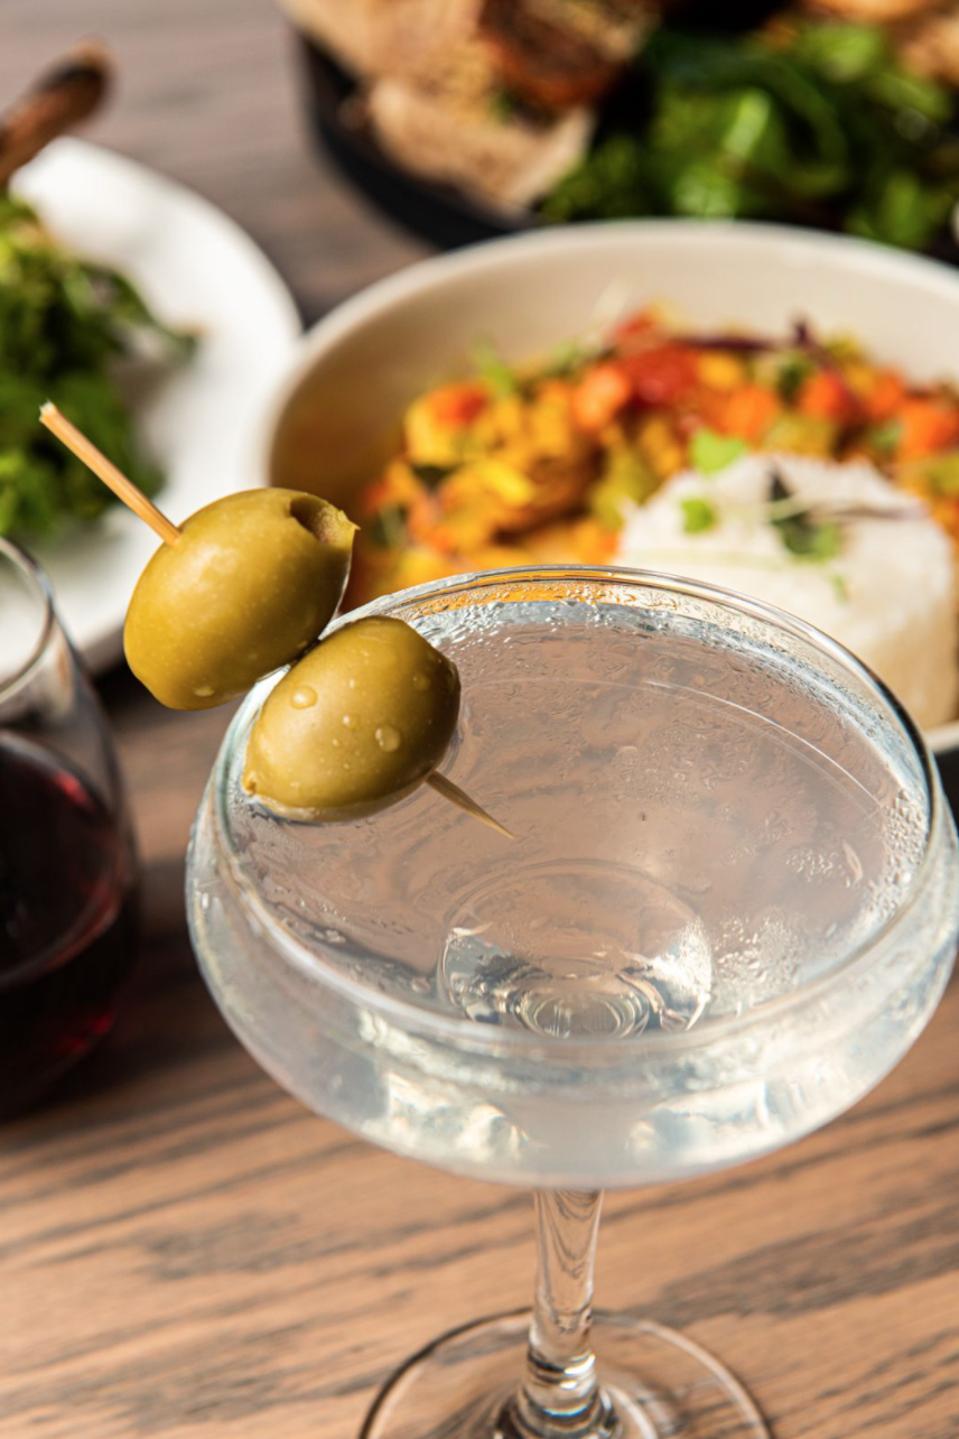 Wilder's filled olive martini